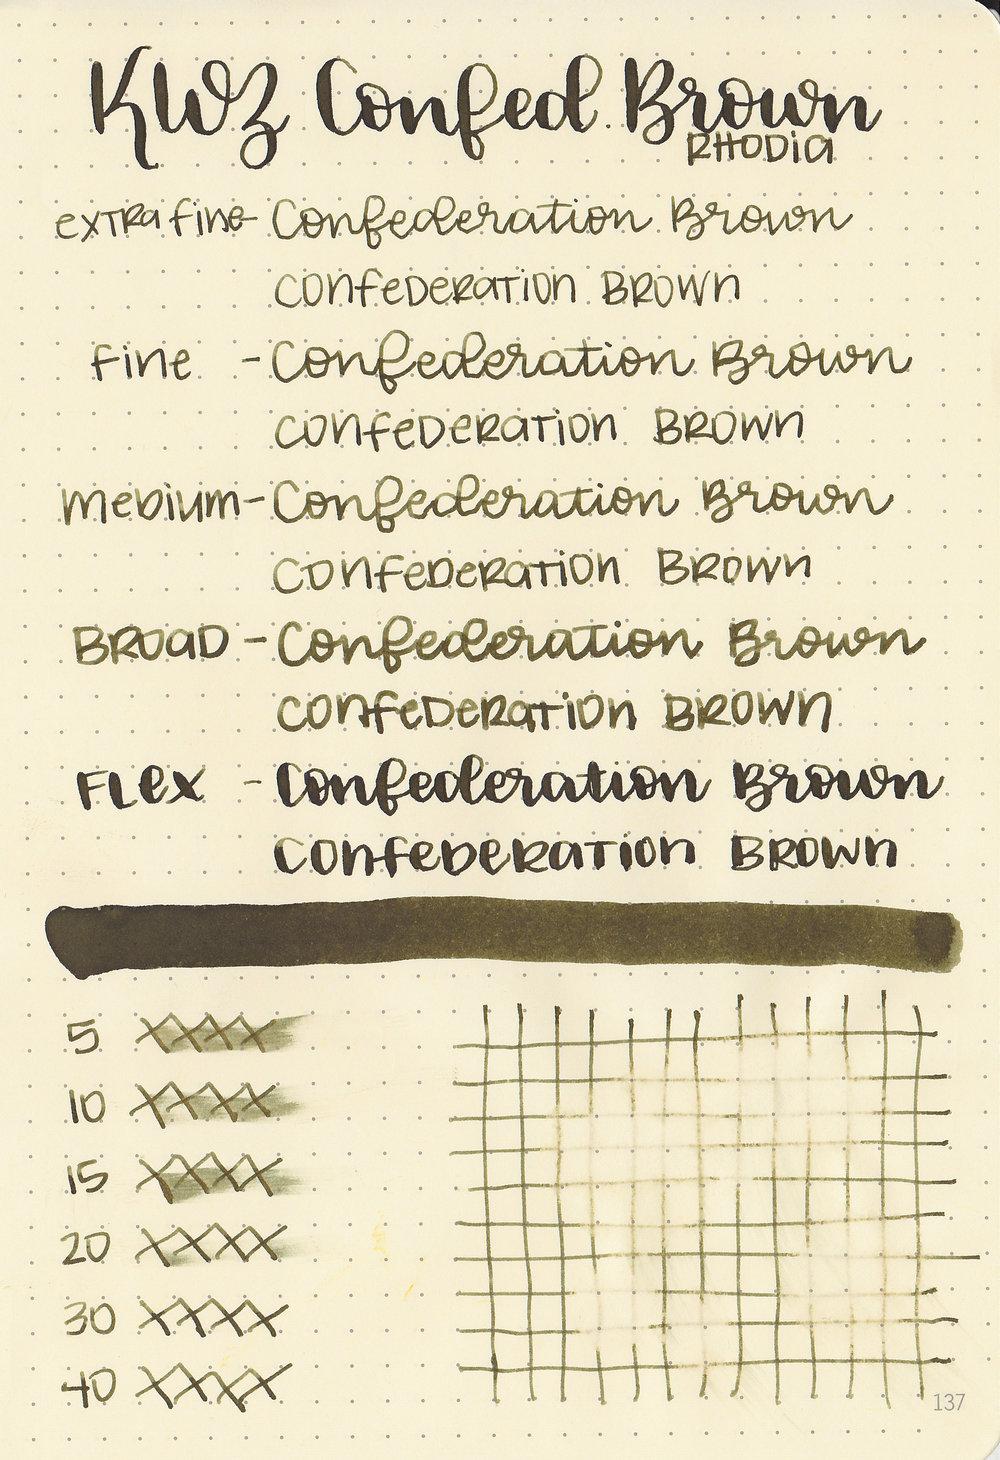 kwz-confederation-brown-4.jpg